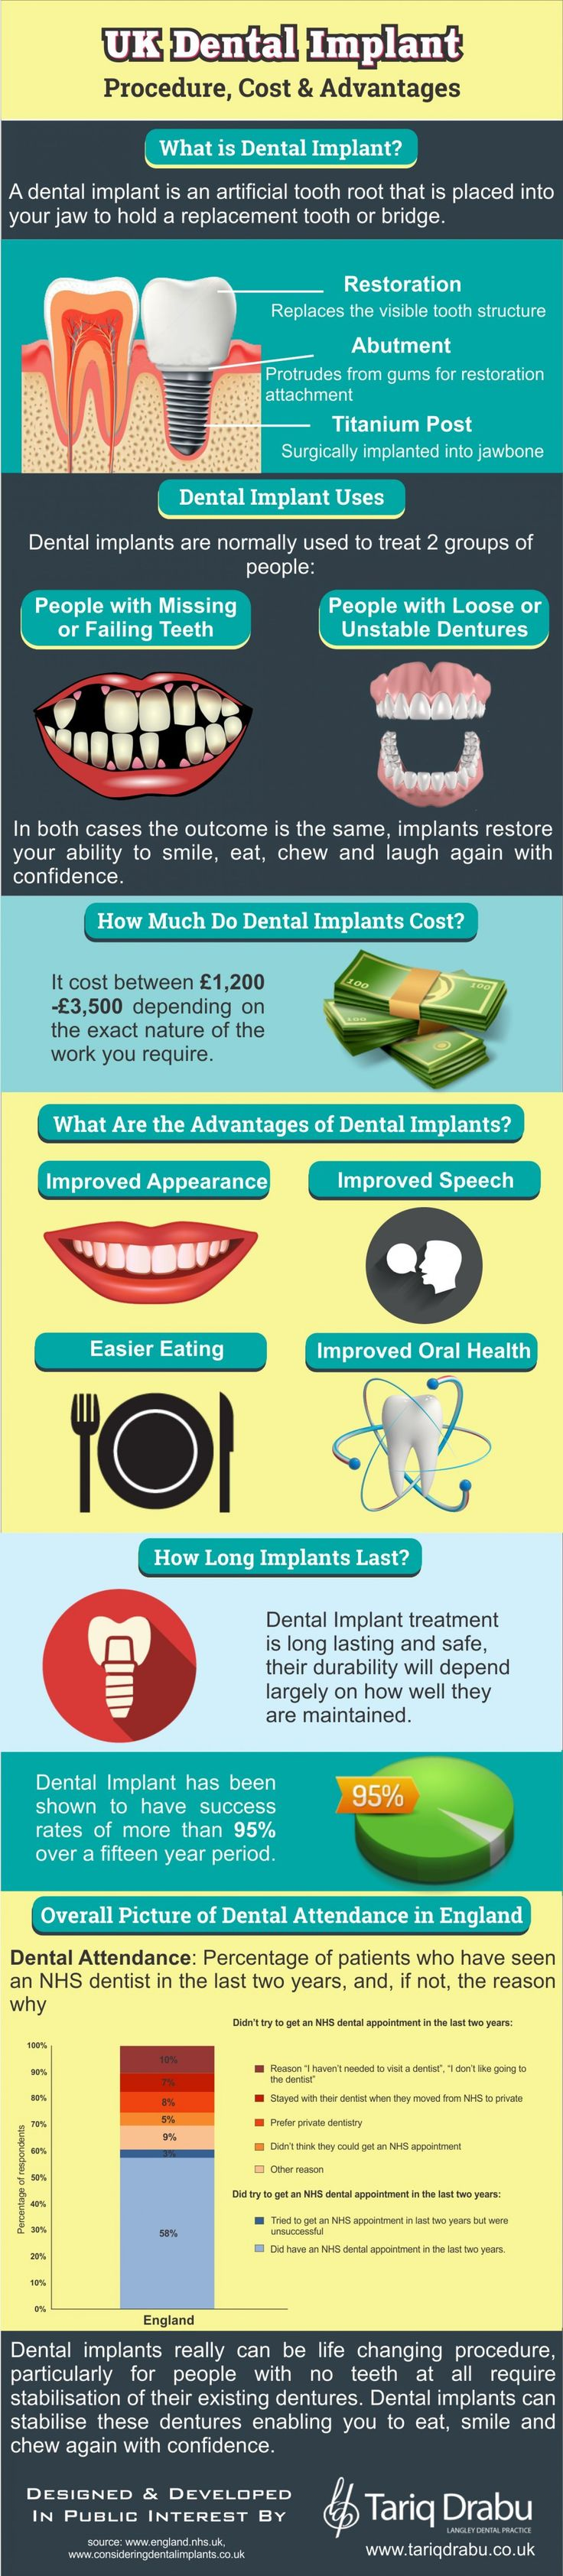 UK Dental Implant Procedure, Cost & Advantages